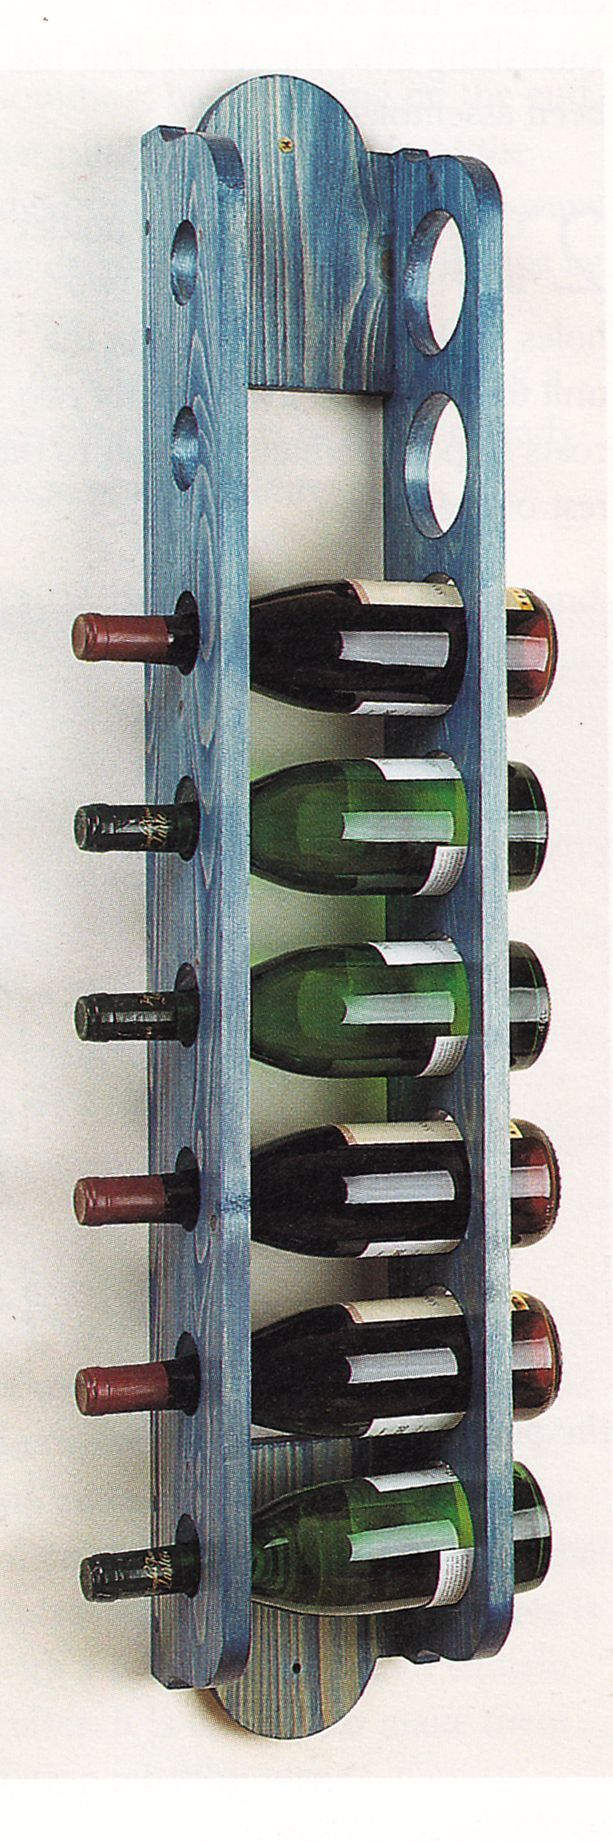 Best 25+ Wine rack plans ideas on Pinterest   Build a wine rack, Wine rack  design and Wine racks